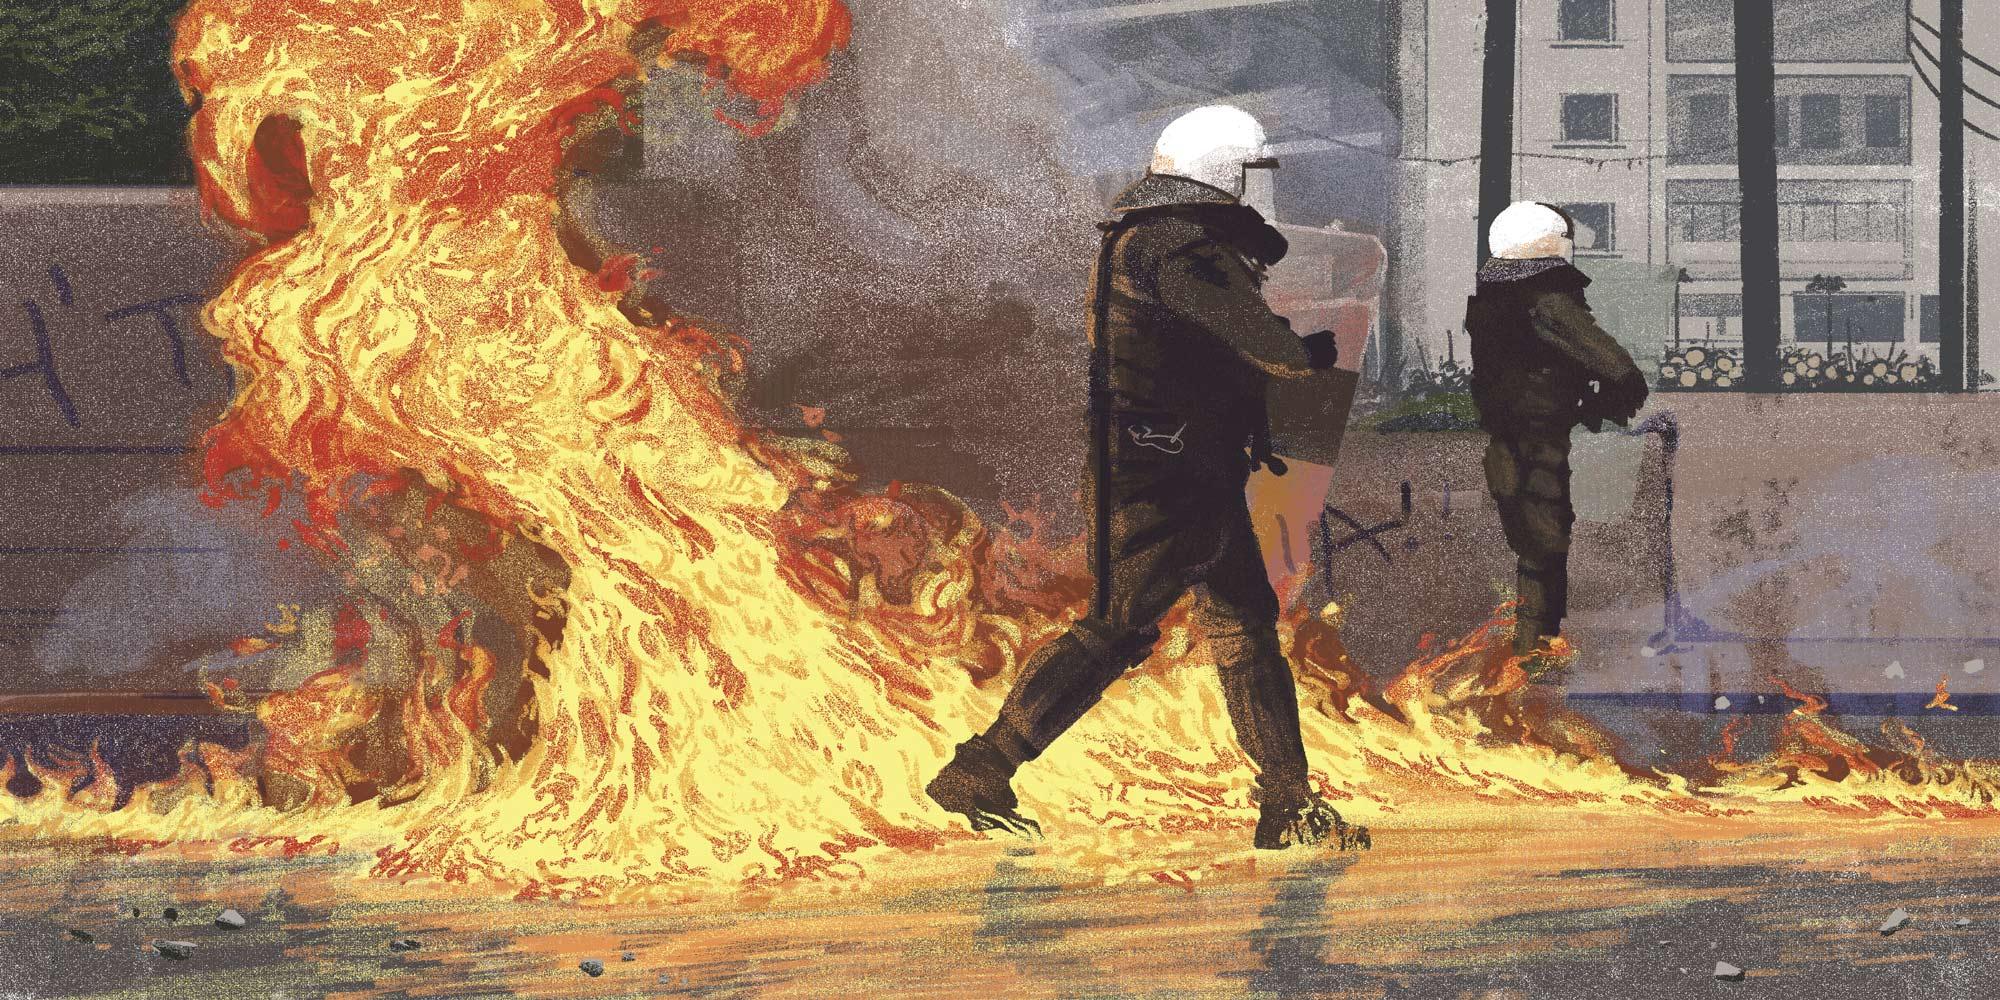 flames-molotov-coctail-riots-athens-illustration.jpg